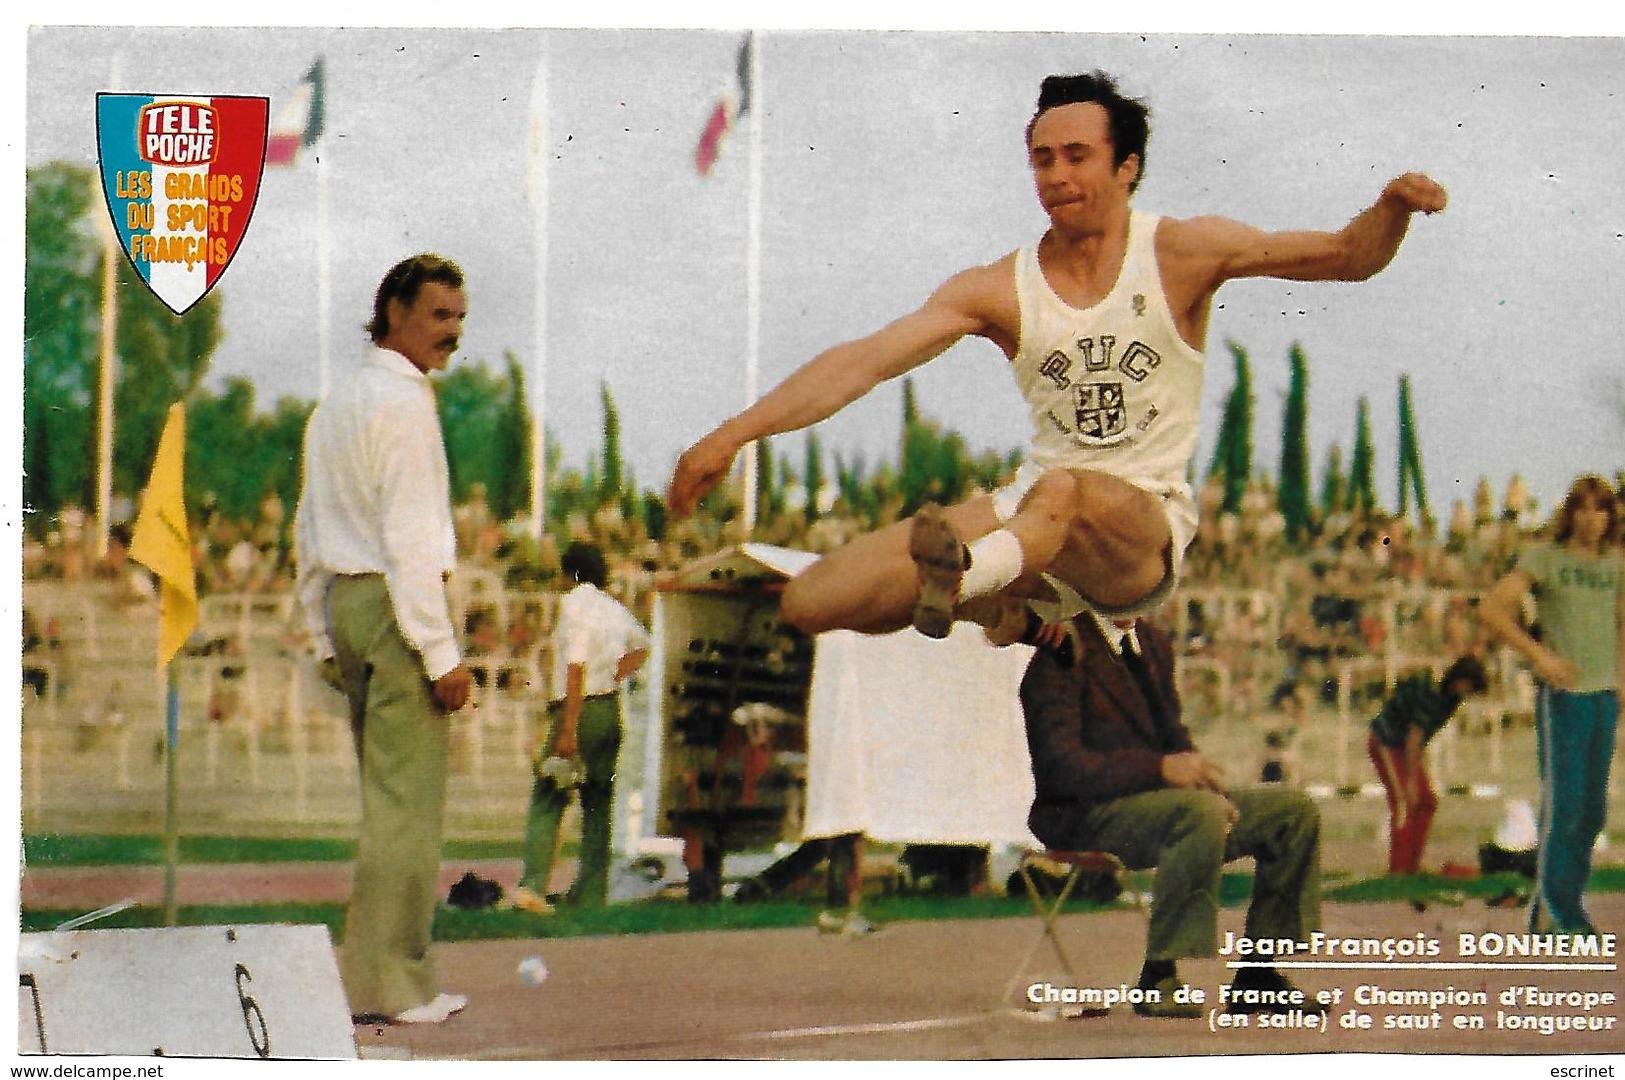 BONHEME Jean-François - Athlétisme